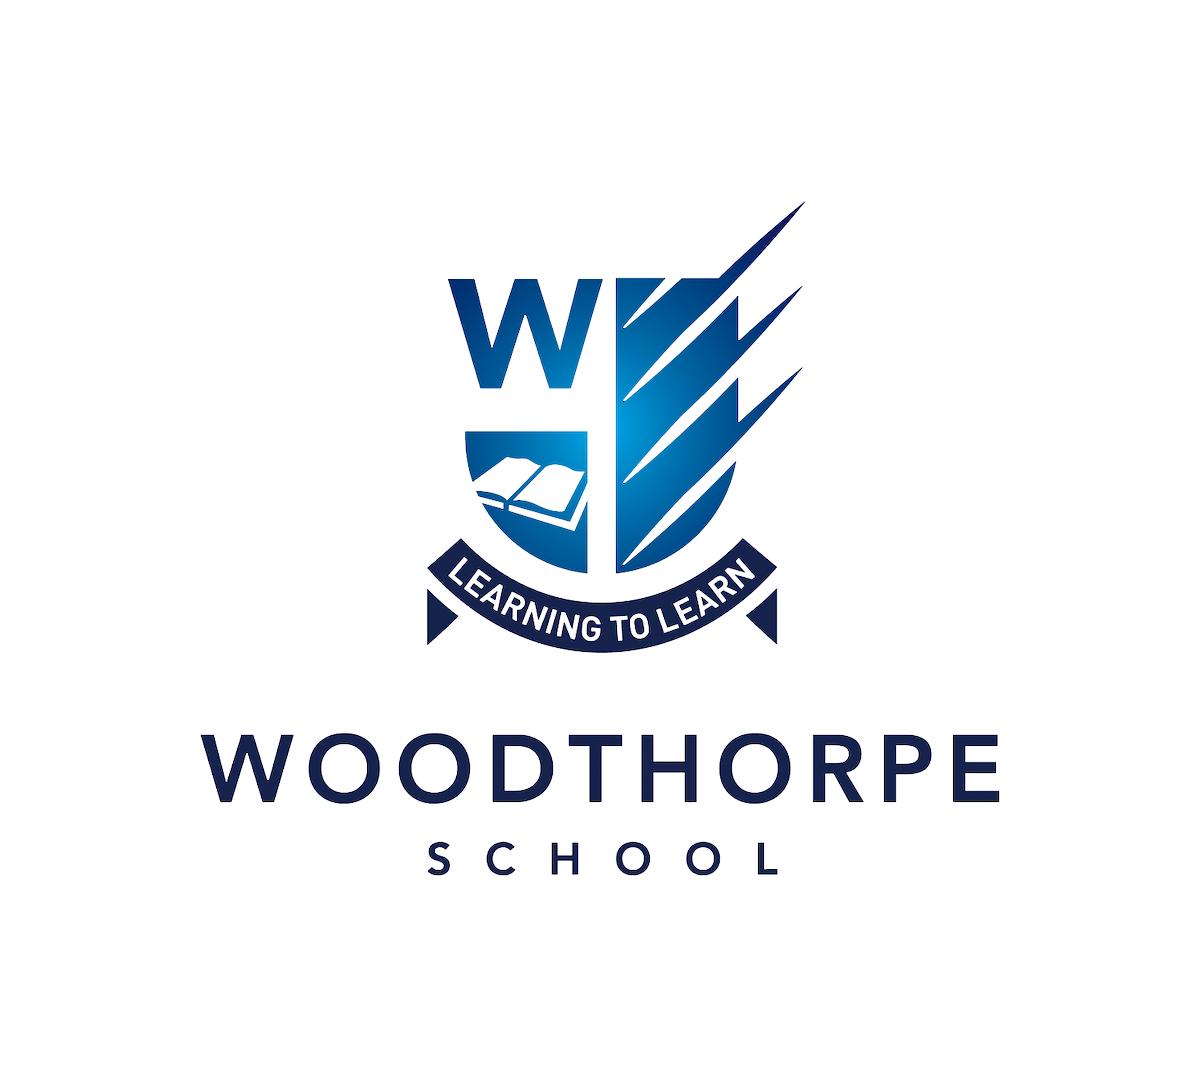 Woodthorpe School Logo